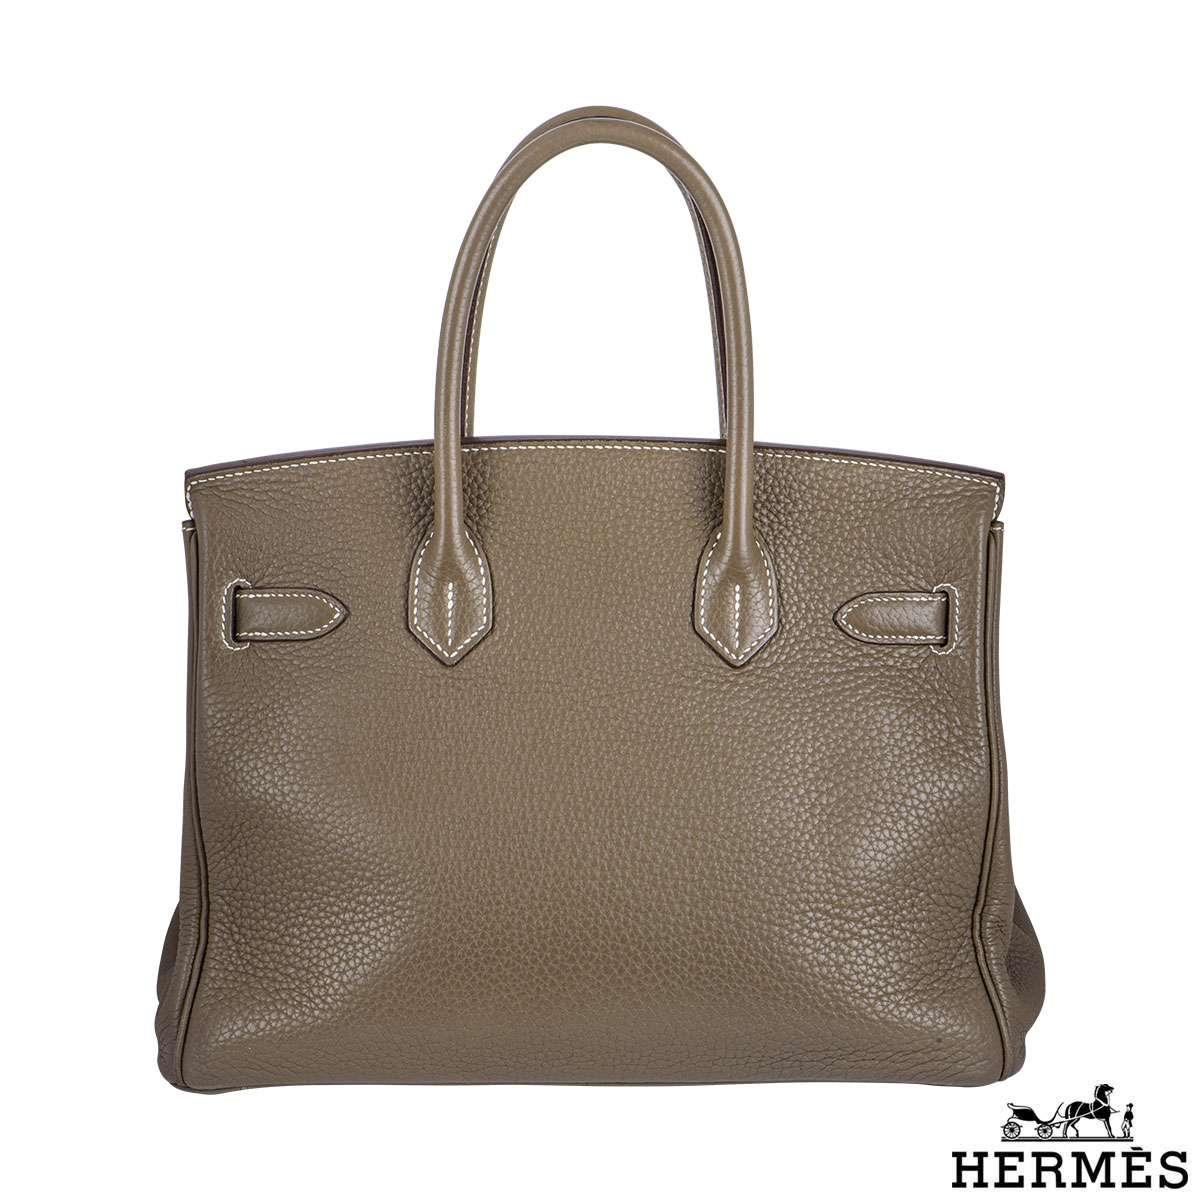 Hermes Birkin 30 cm Etoupe Togo Leather Handbag